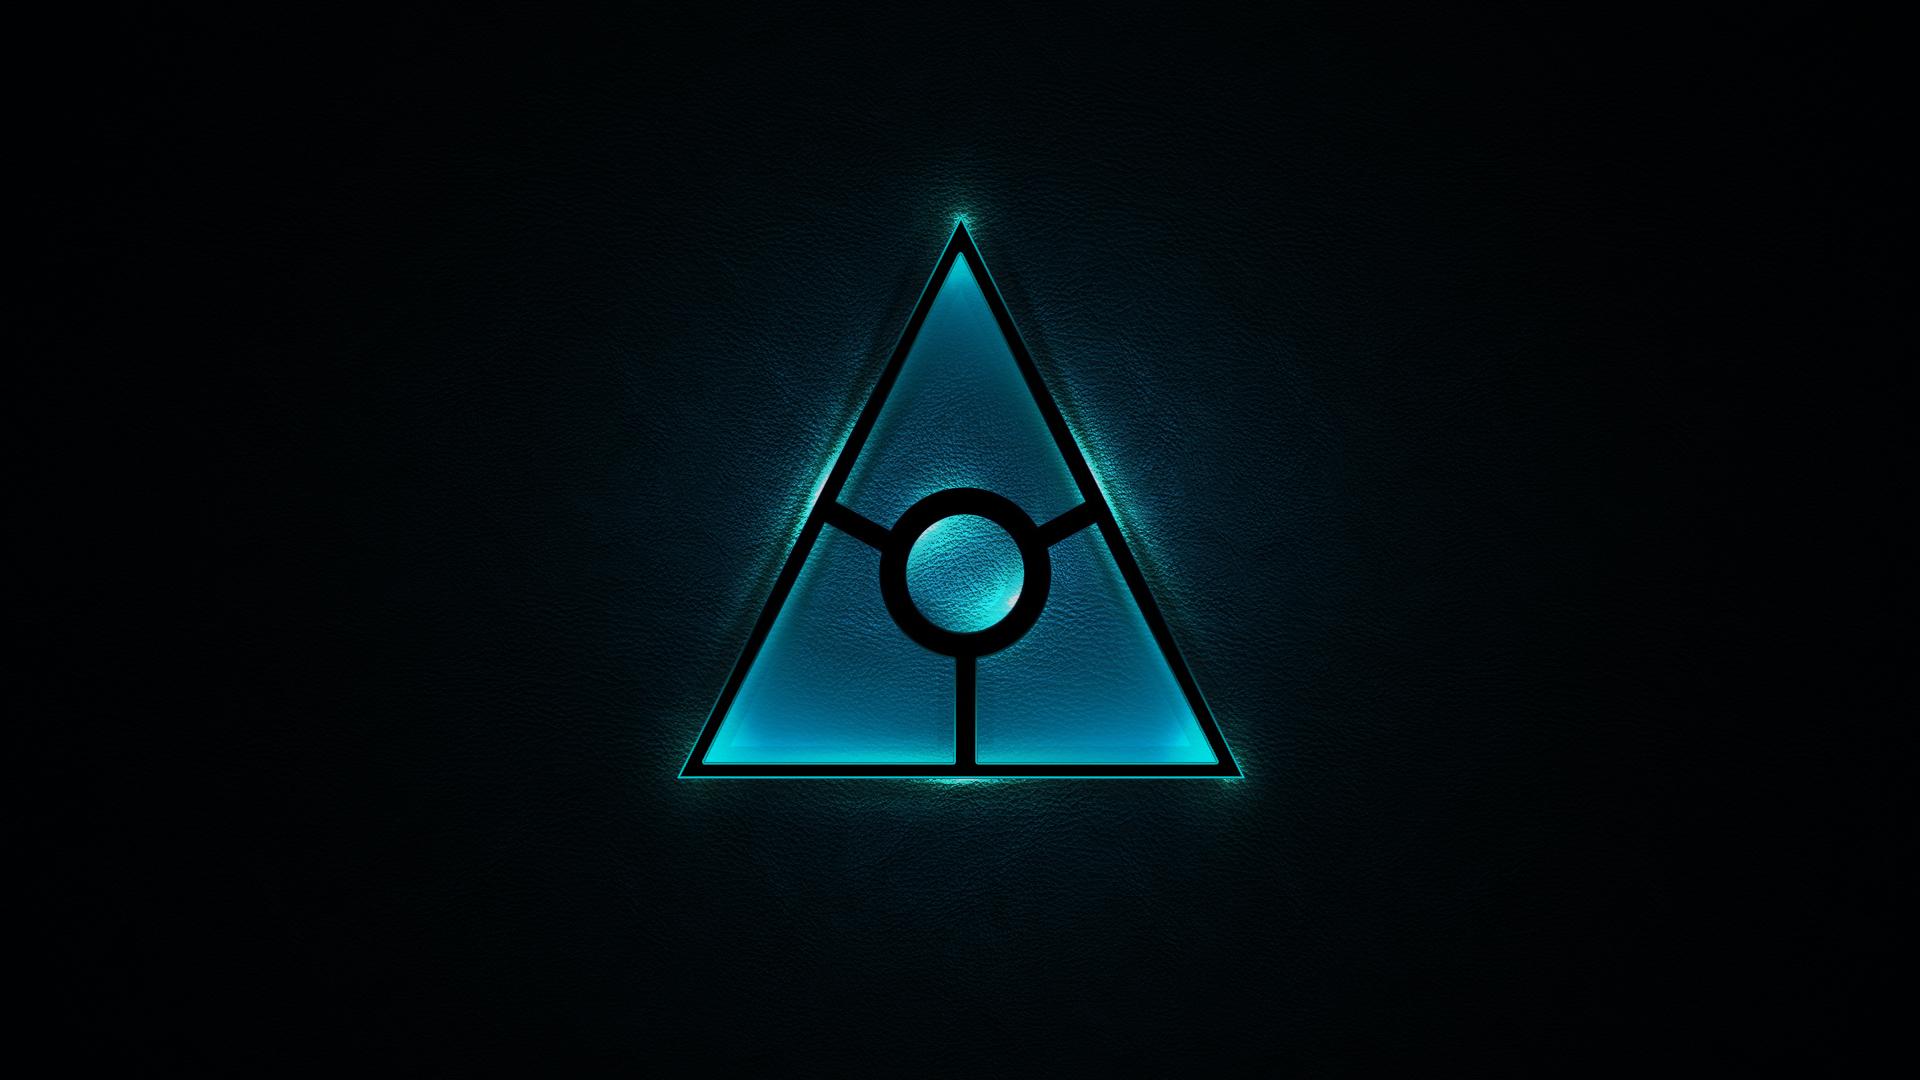 illuminati symbol wallpaper 1920x1080 - photo #1